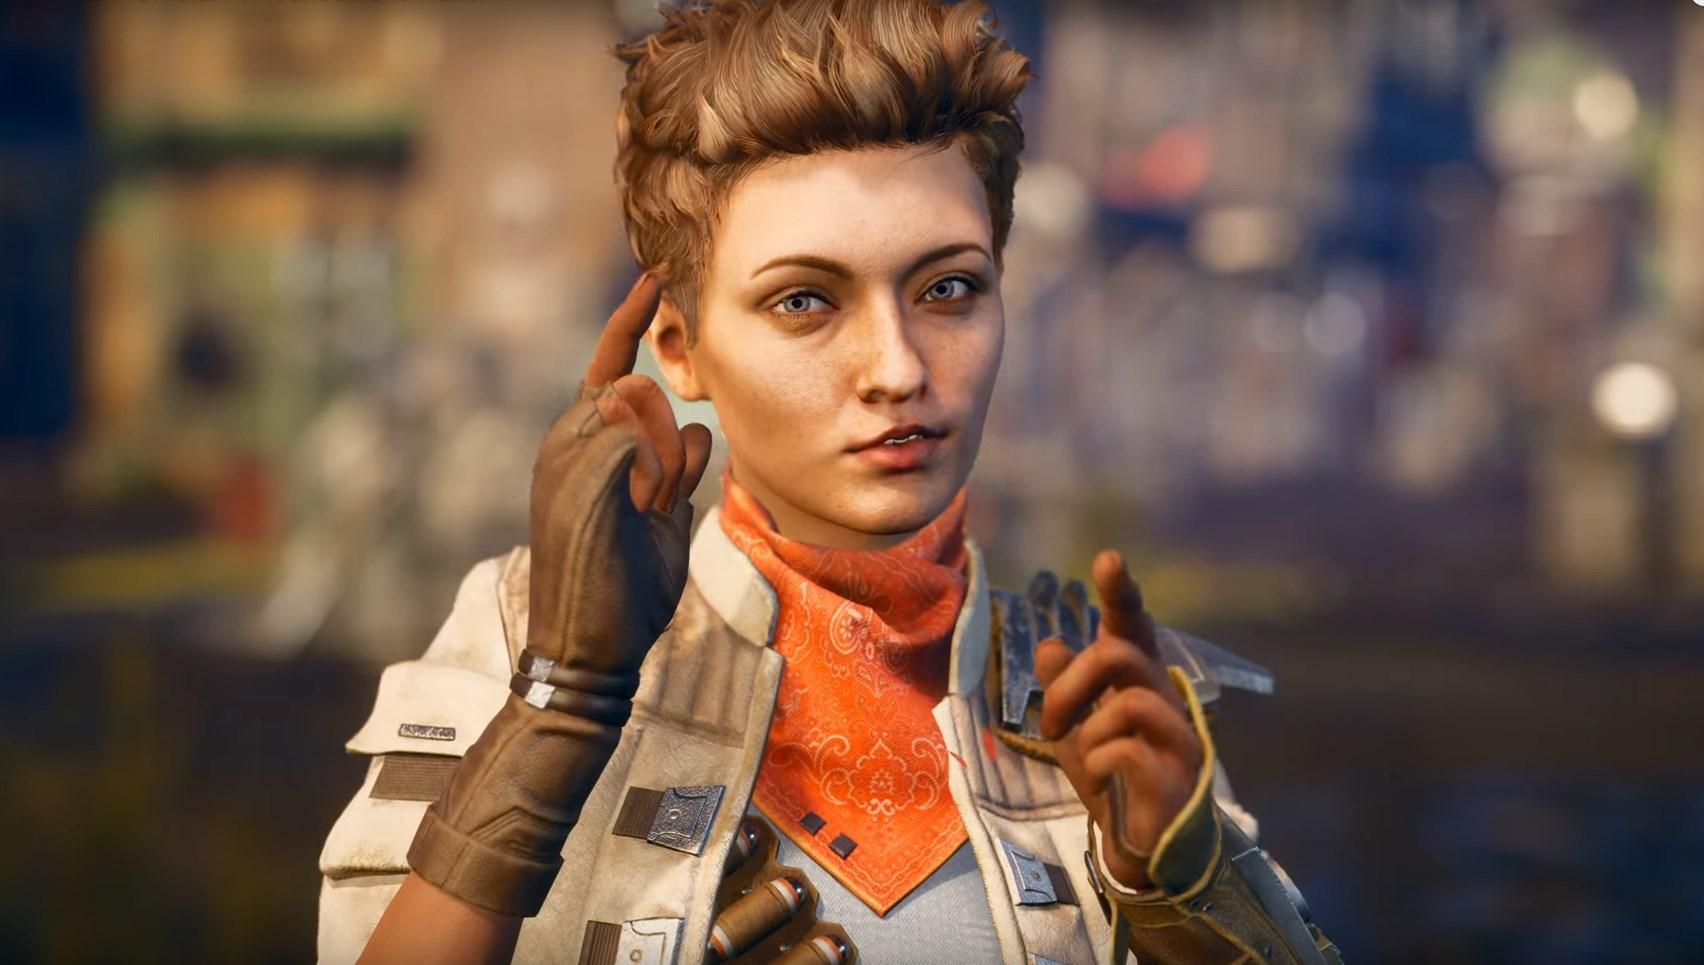 Официально: The Outer Worlds, Control и Ancestors станут эксклюзивами Epic Games Store